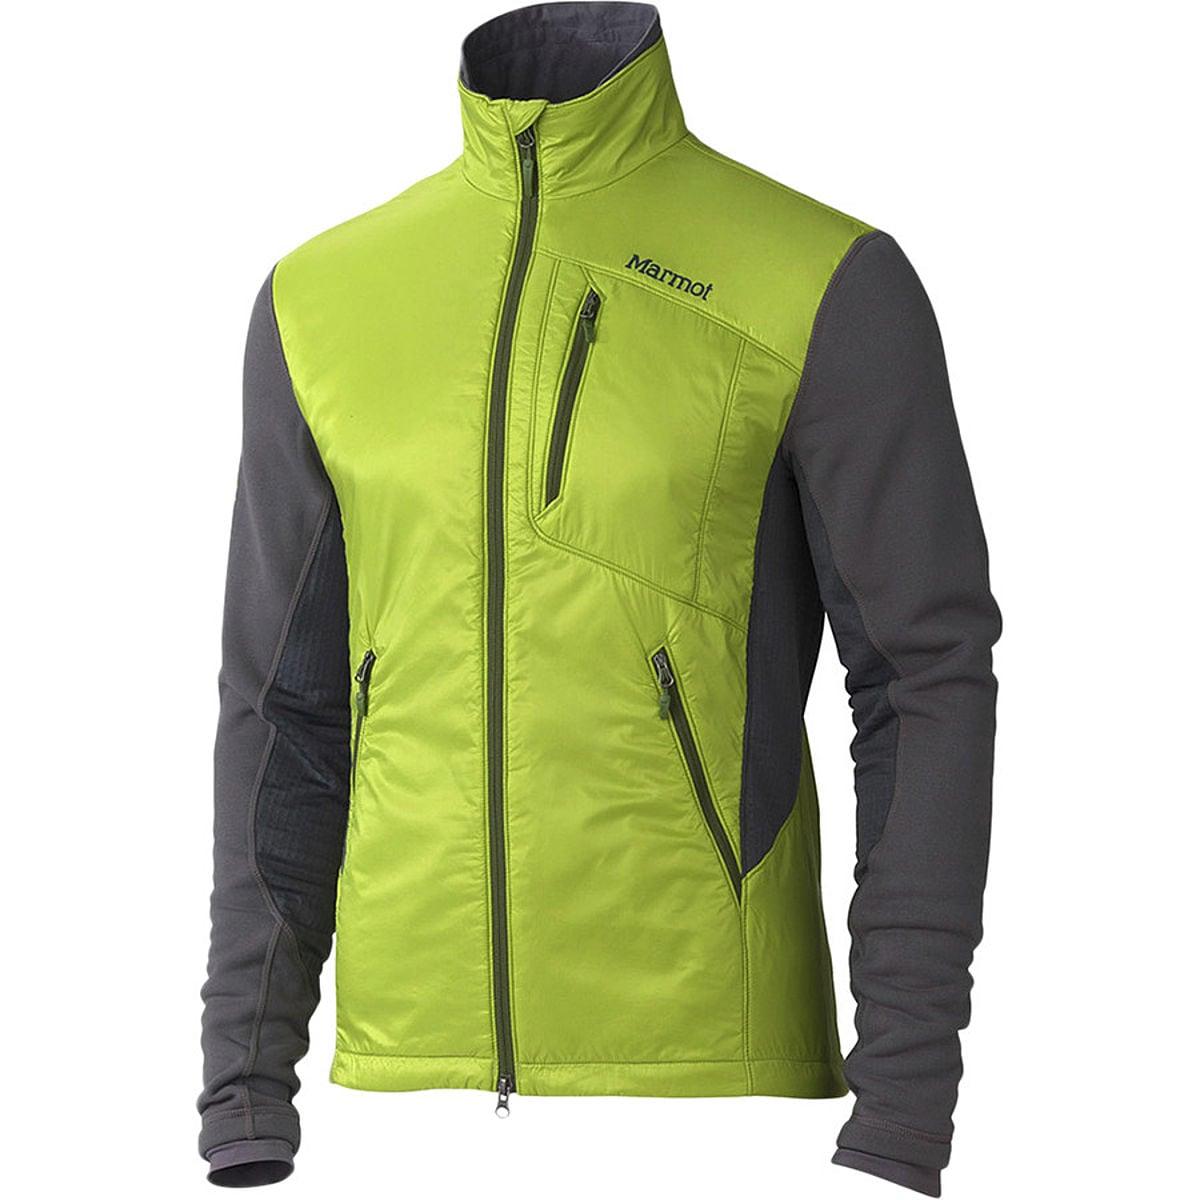 Marmot Alpha Pro Insulated Jacket - Men